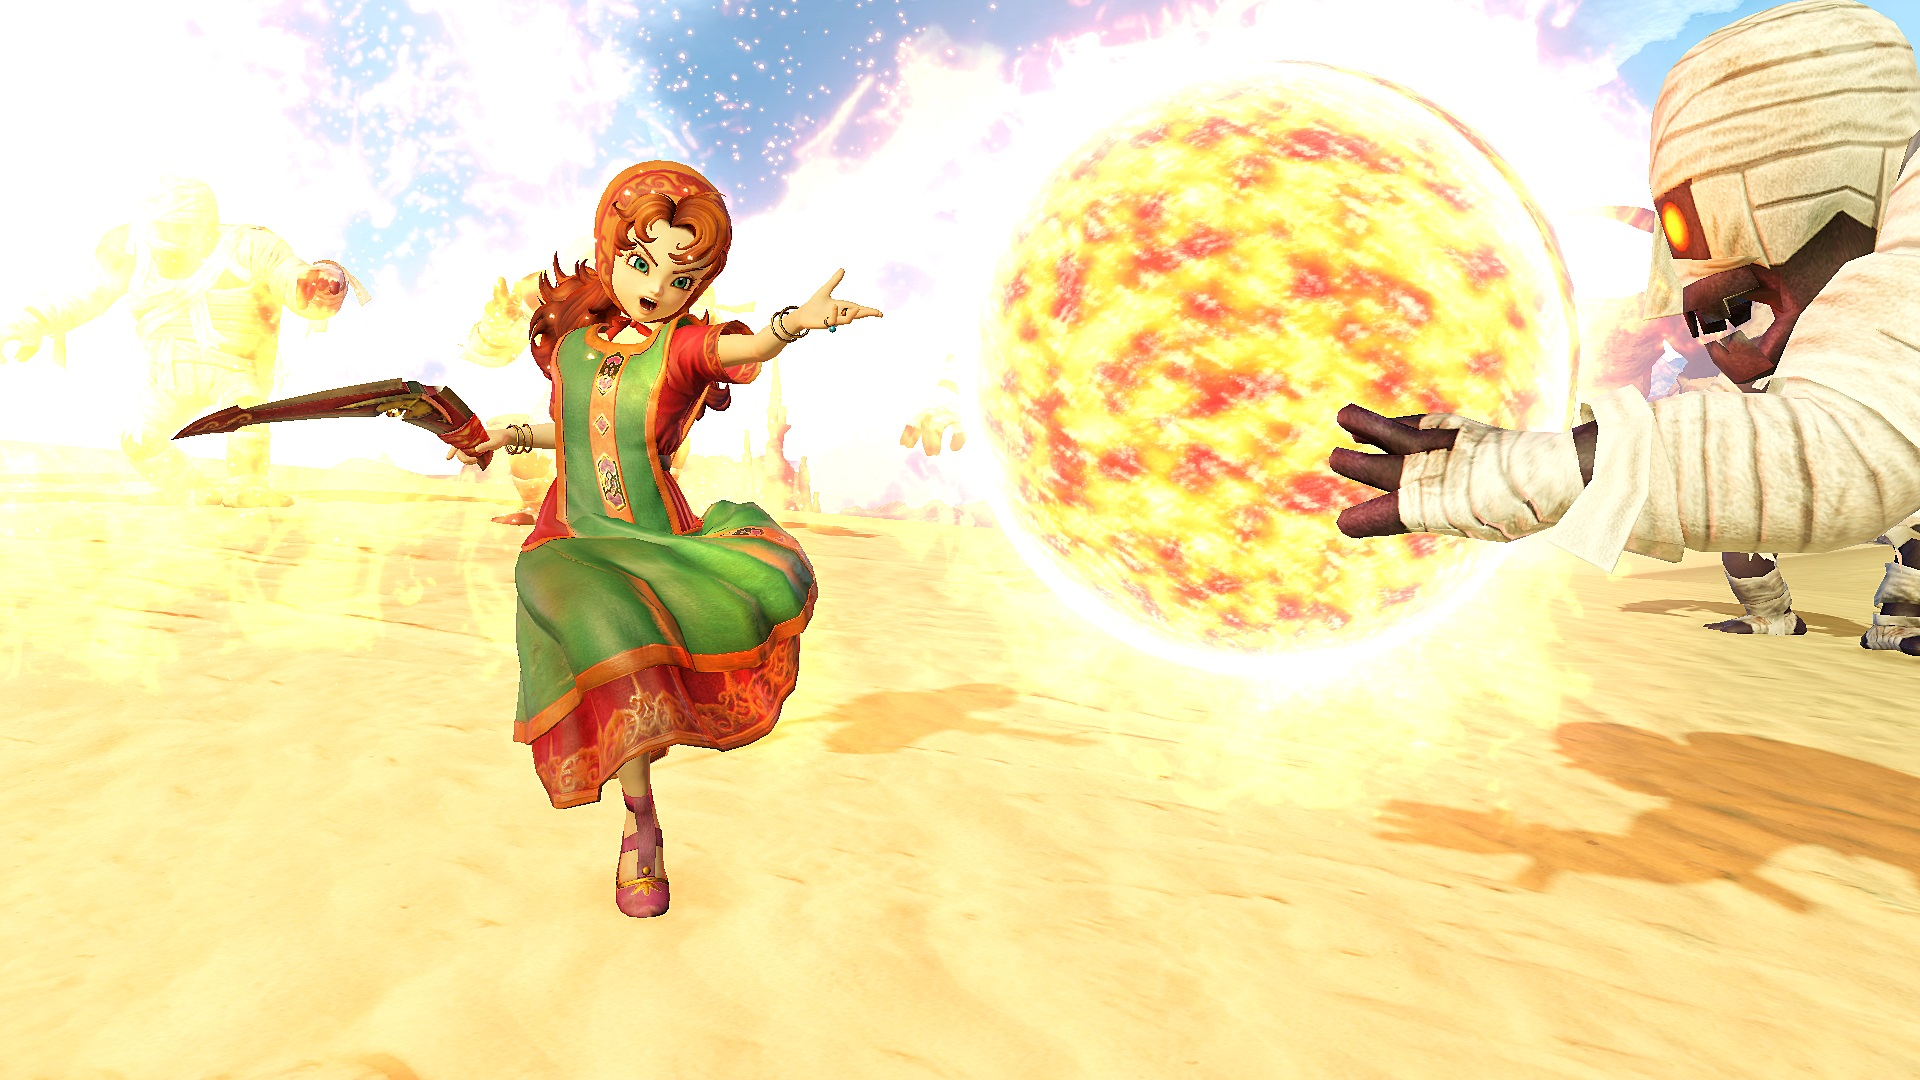 dragon-quest-heroes-2-pc-screenshot-1